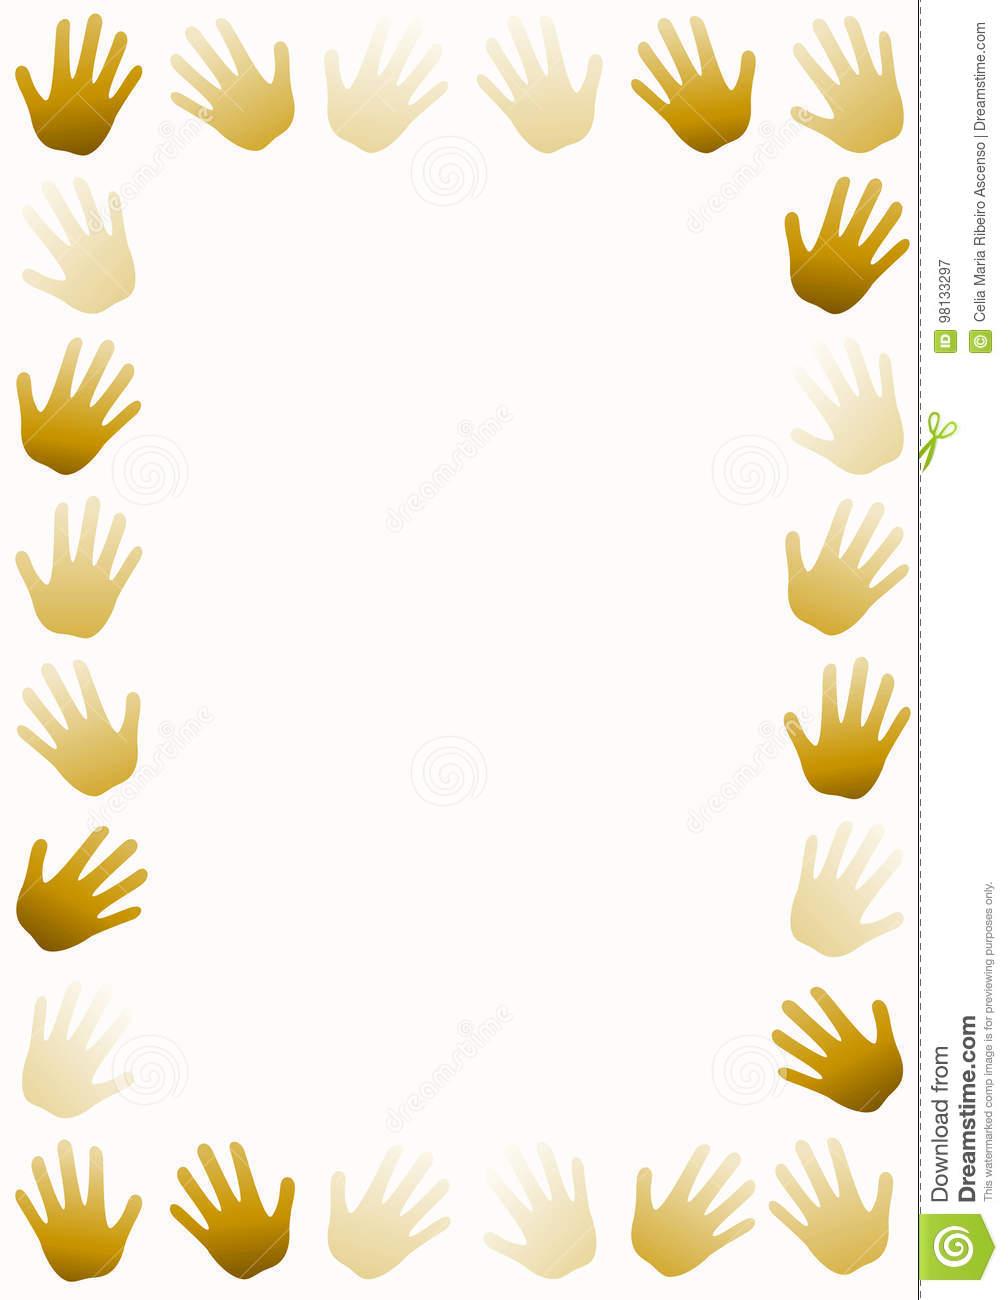 Hand Prints Around Frame Border Stock Illustration.